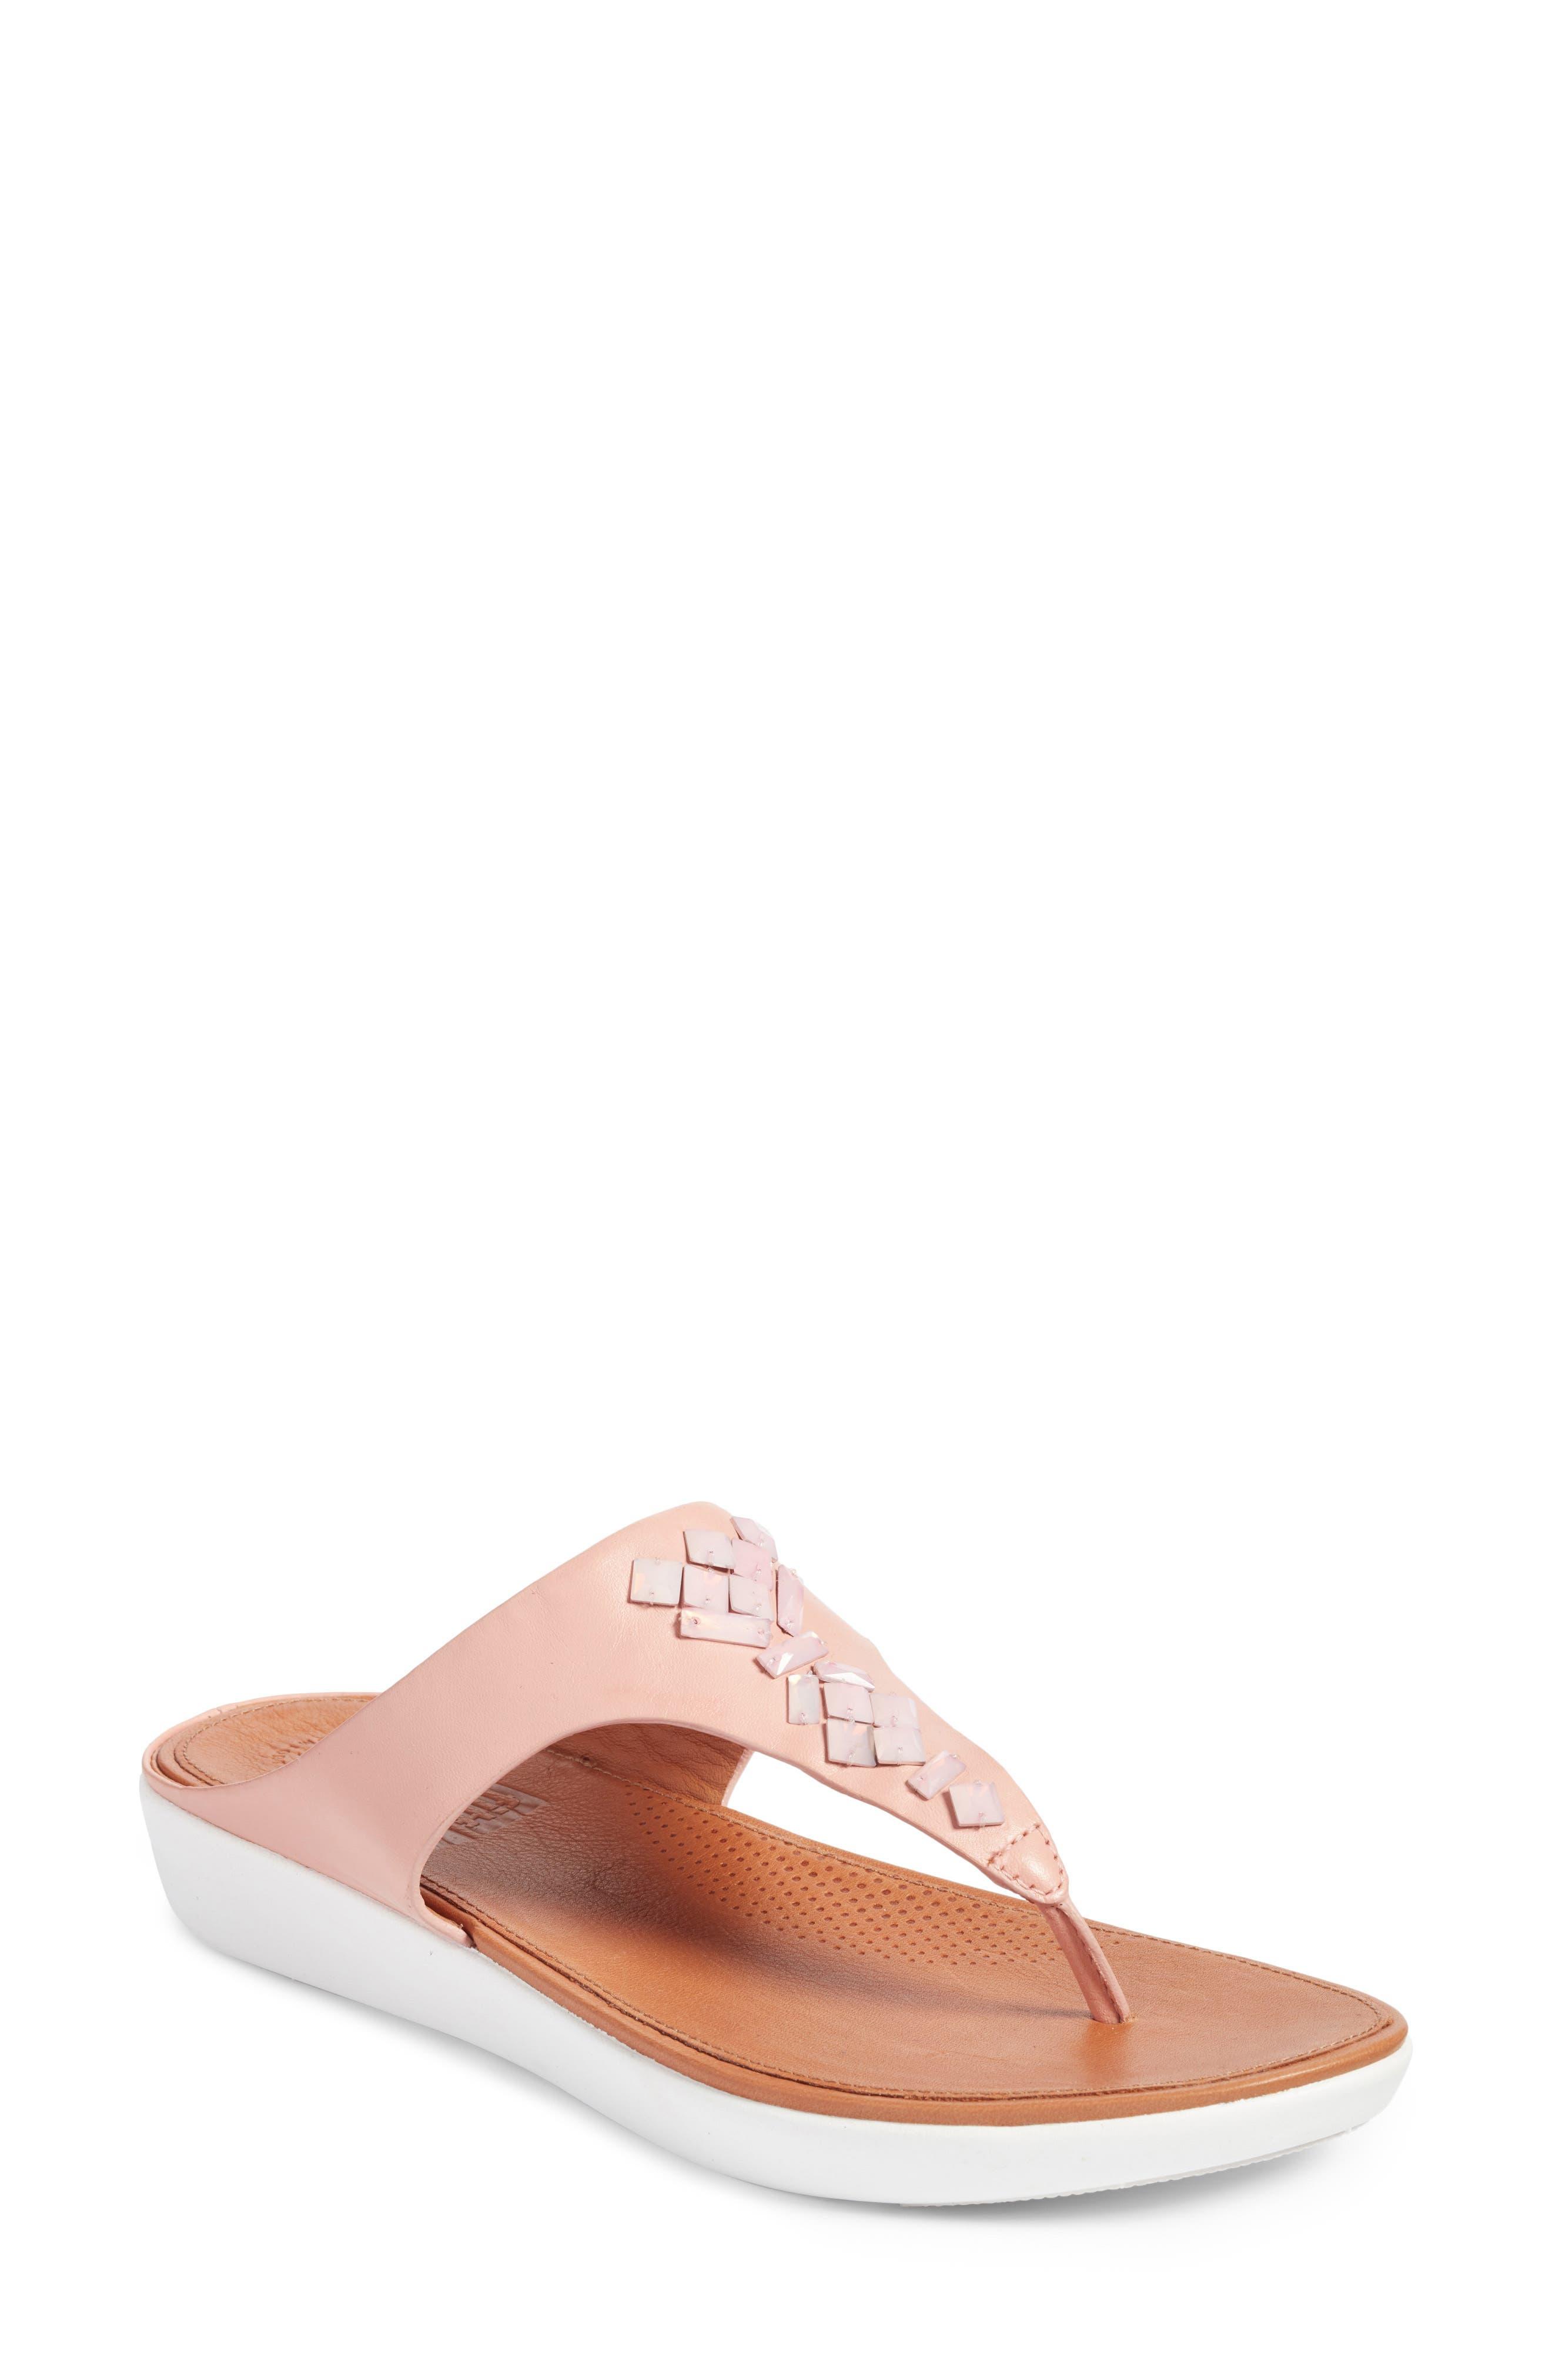 Banda Sandal, Dusty Pink Leather